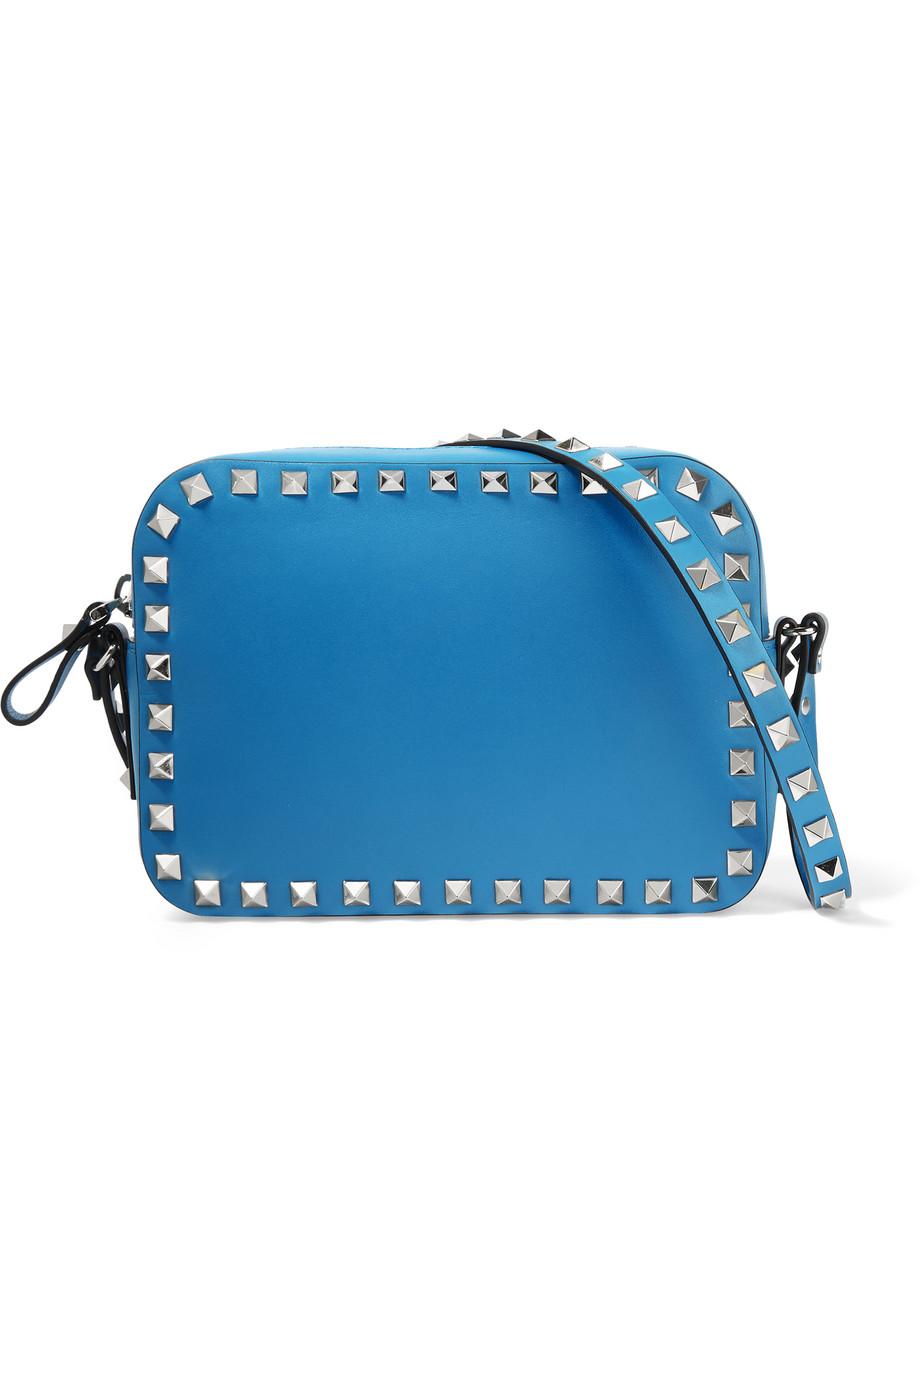 Valentino The Rockstud Leather Shoulder Bag, Bright Blue, Women's